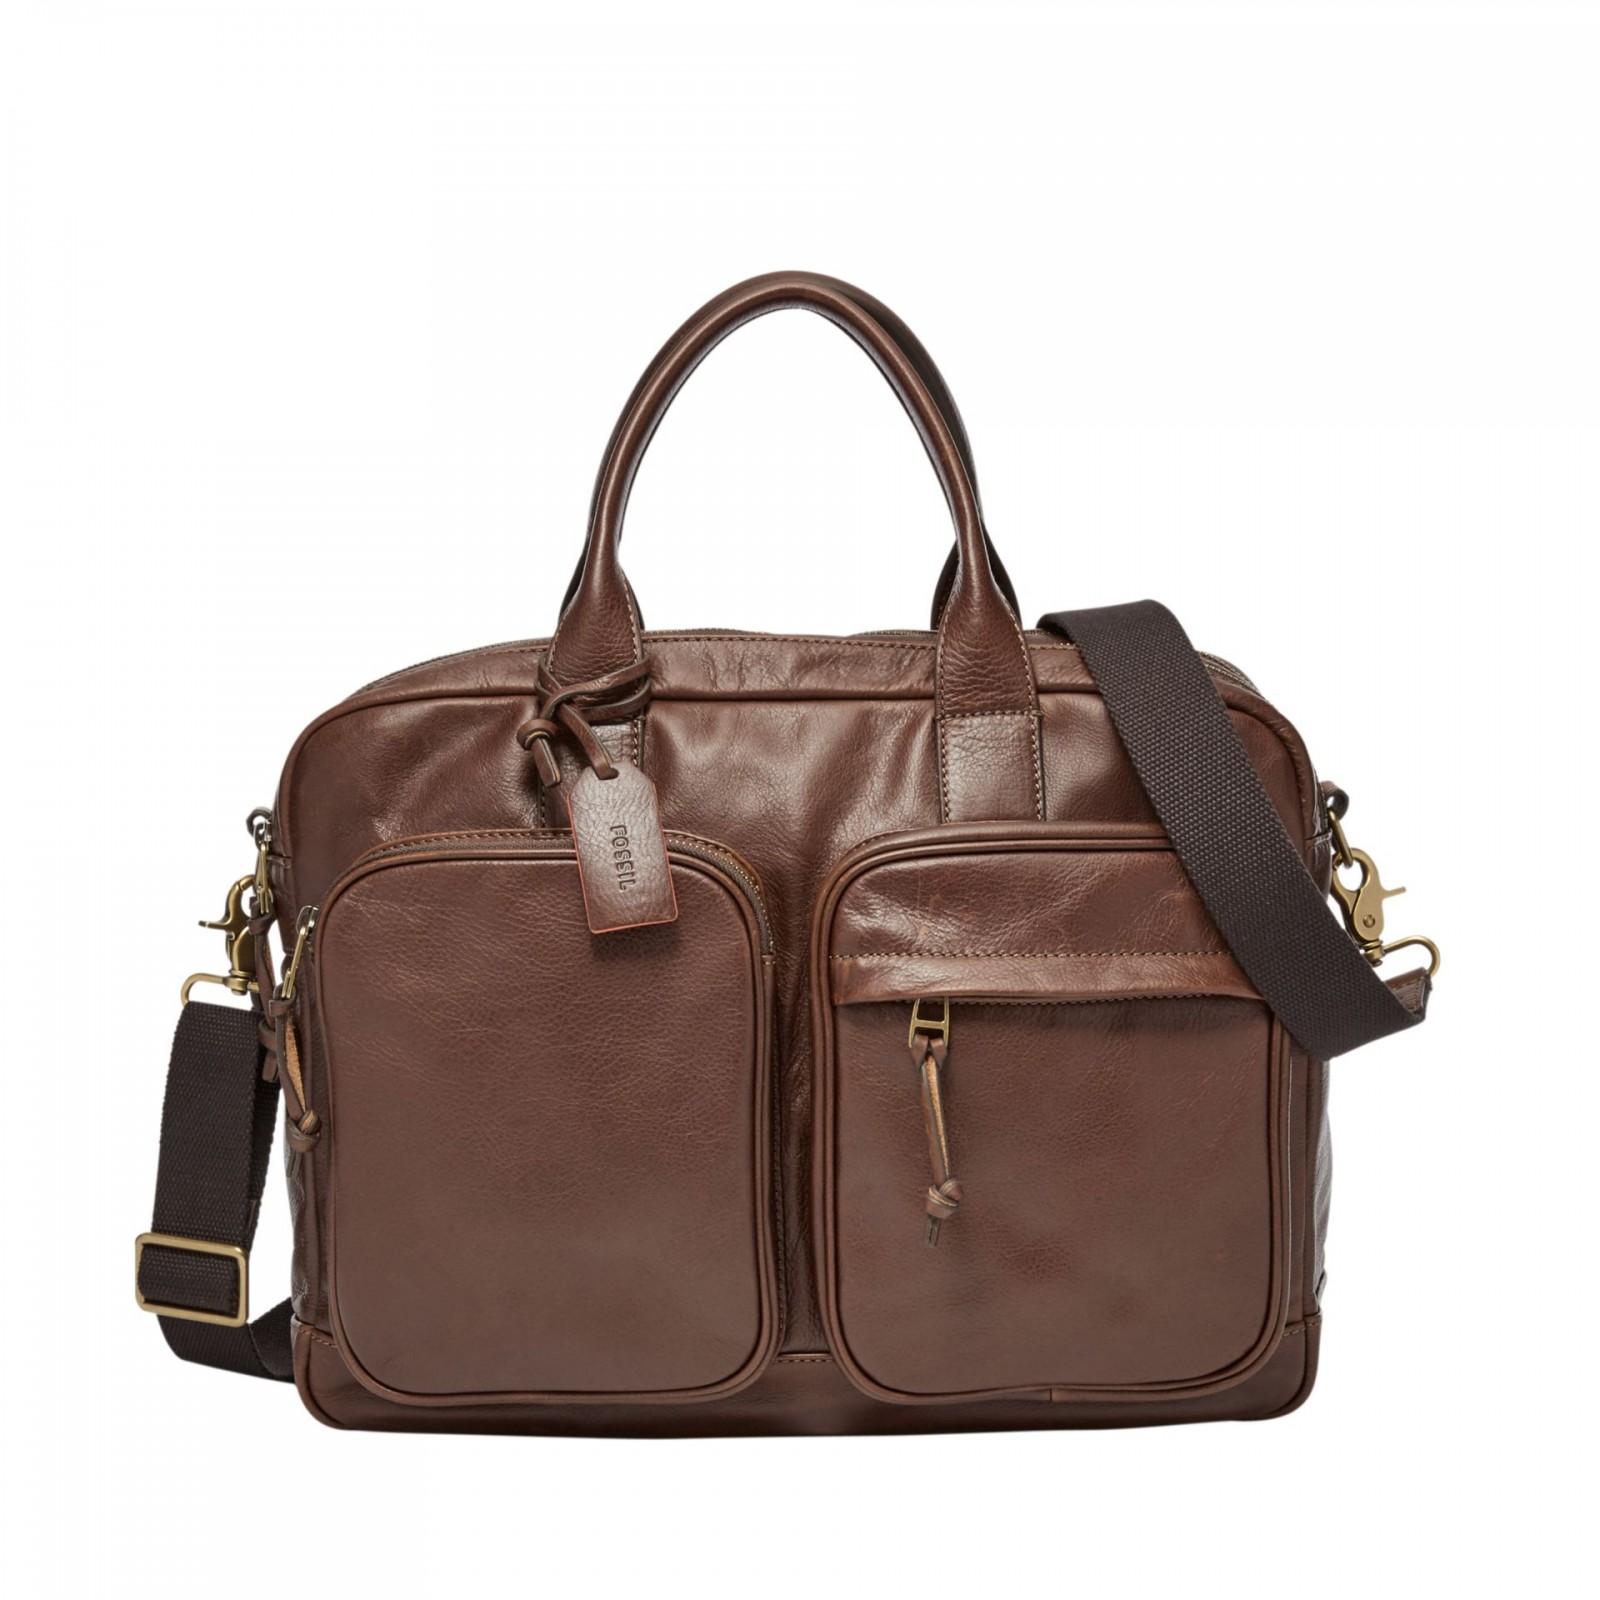 FOSSIL Briefcase Defender Double Zip Workbag Brown